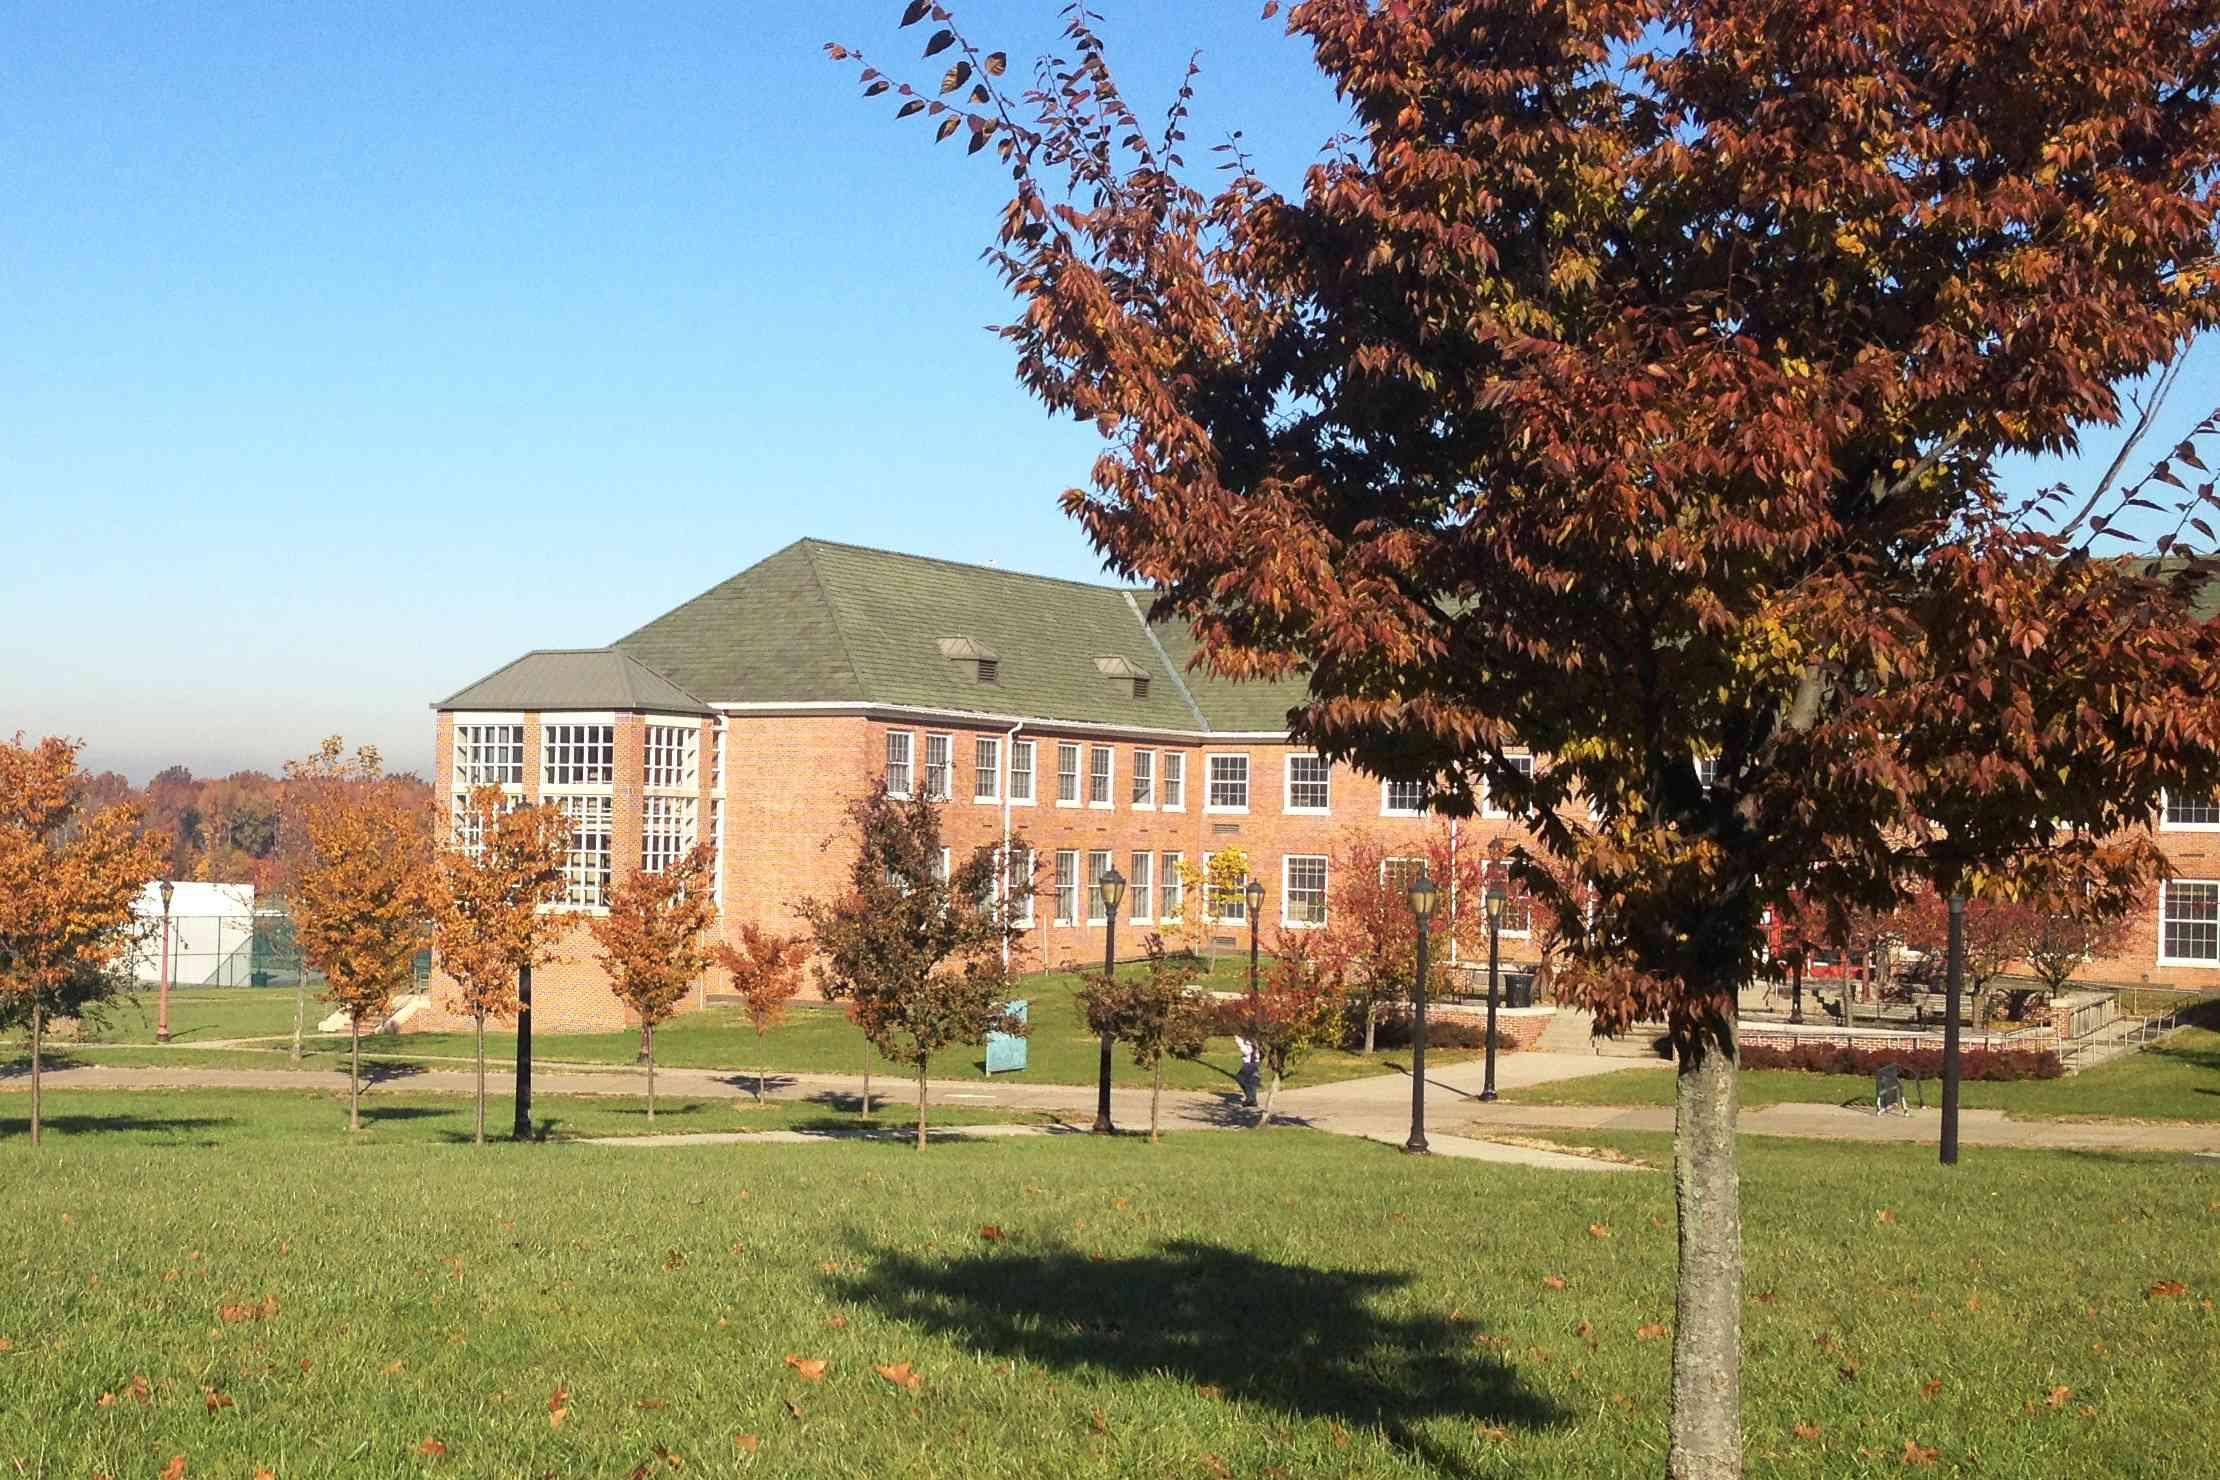 College of Staten Island